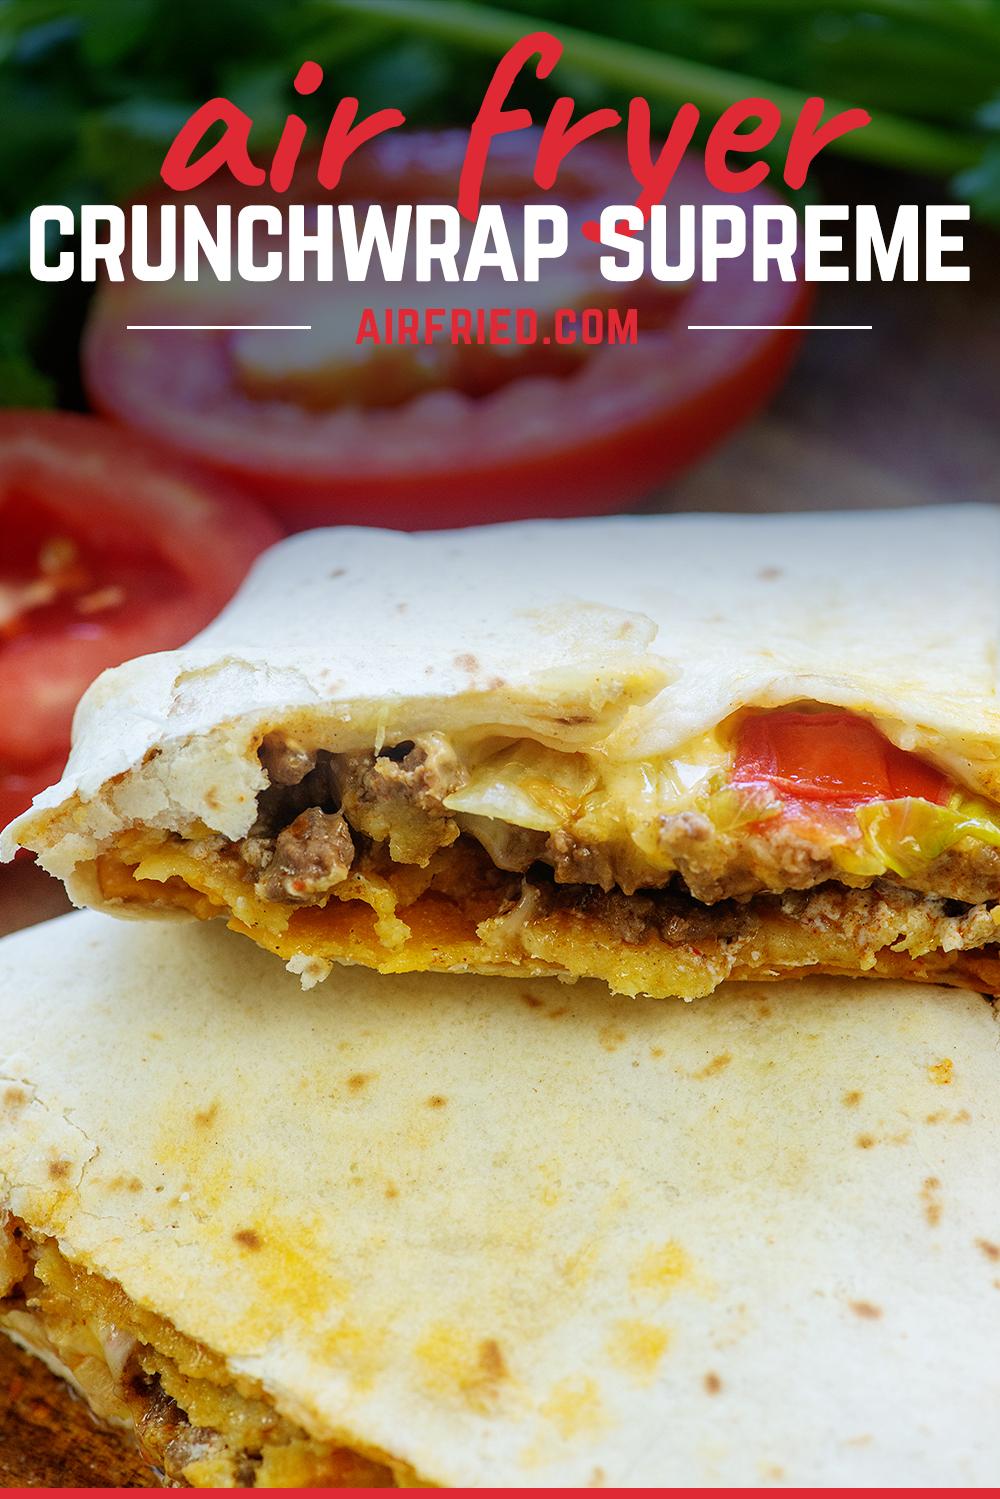 Close up of a split crunchwrap supreme